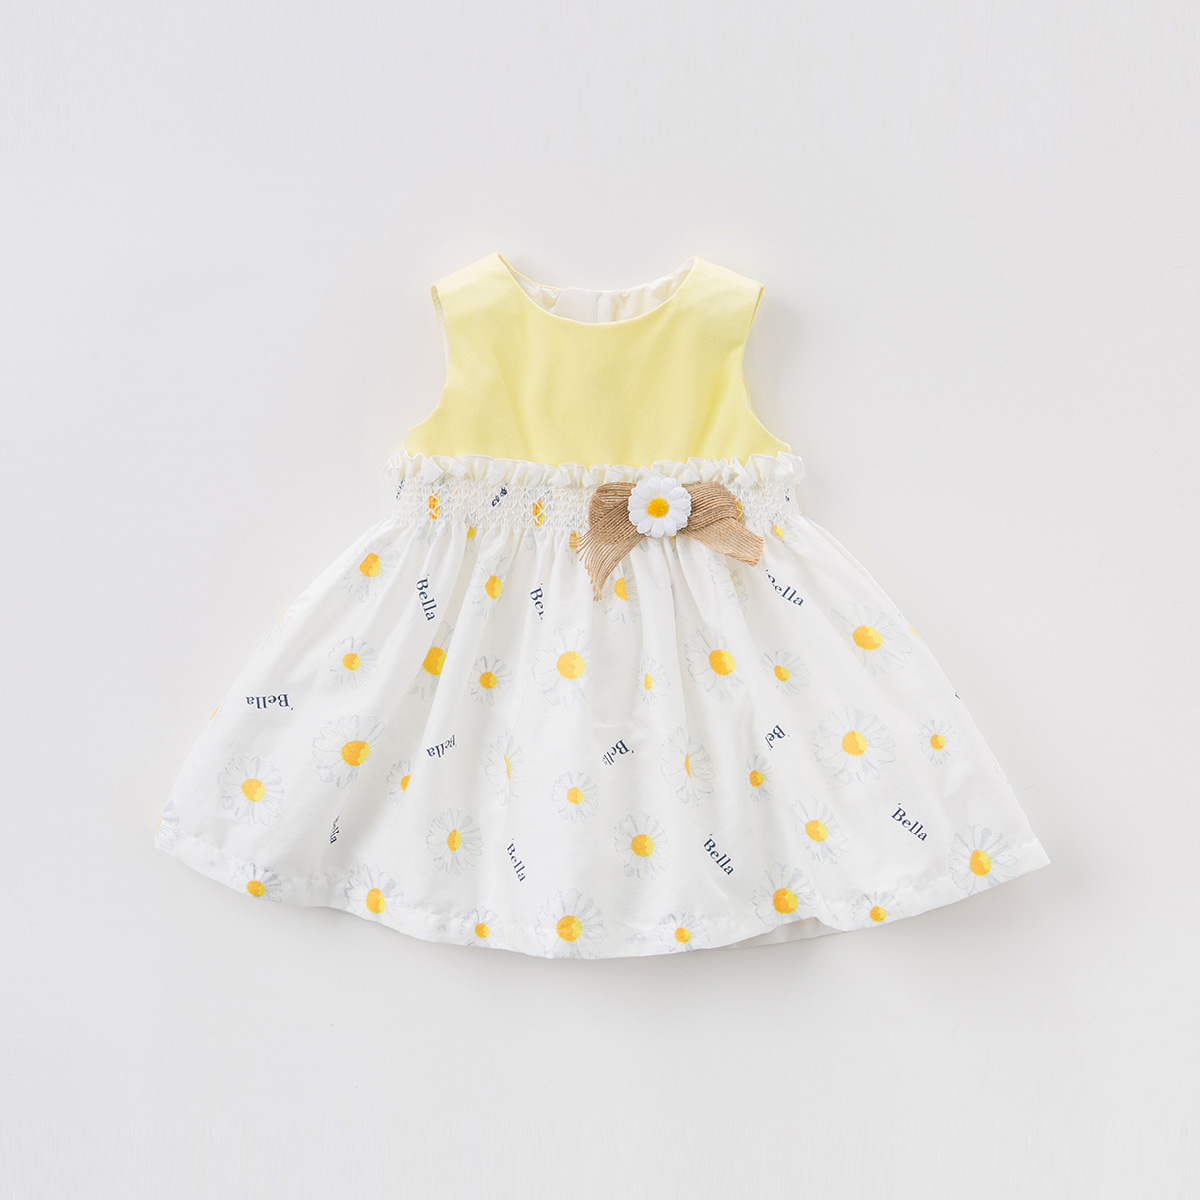 davebella戴维贝拉夏装2018夏季新款女童连衣裙 宝宝背心裙DB7540